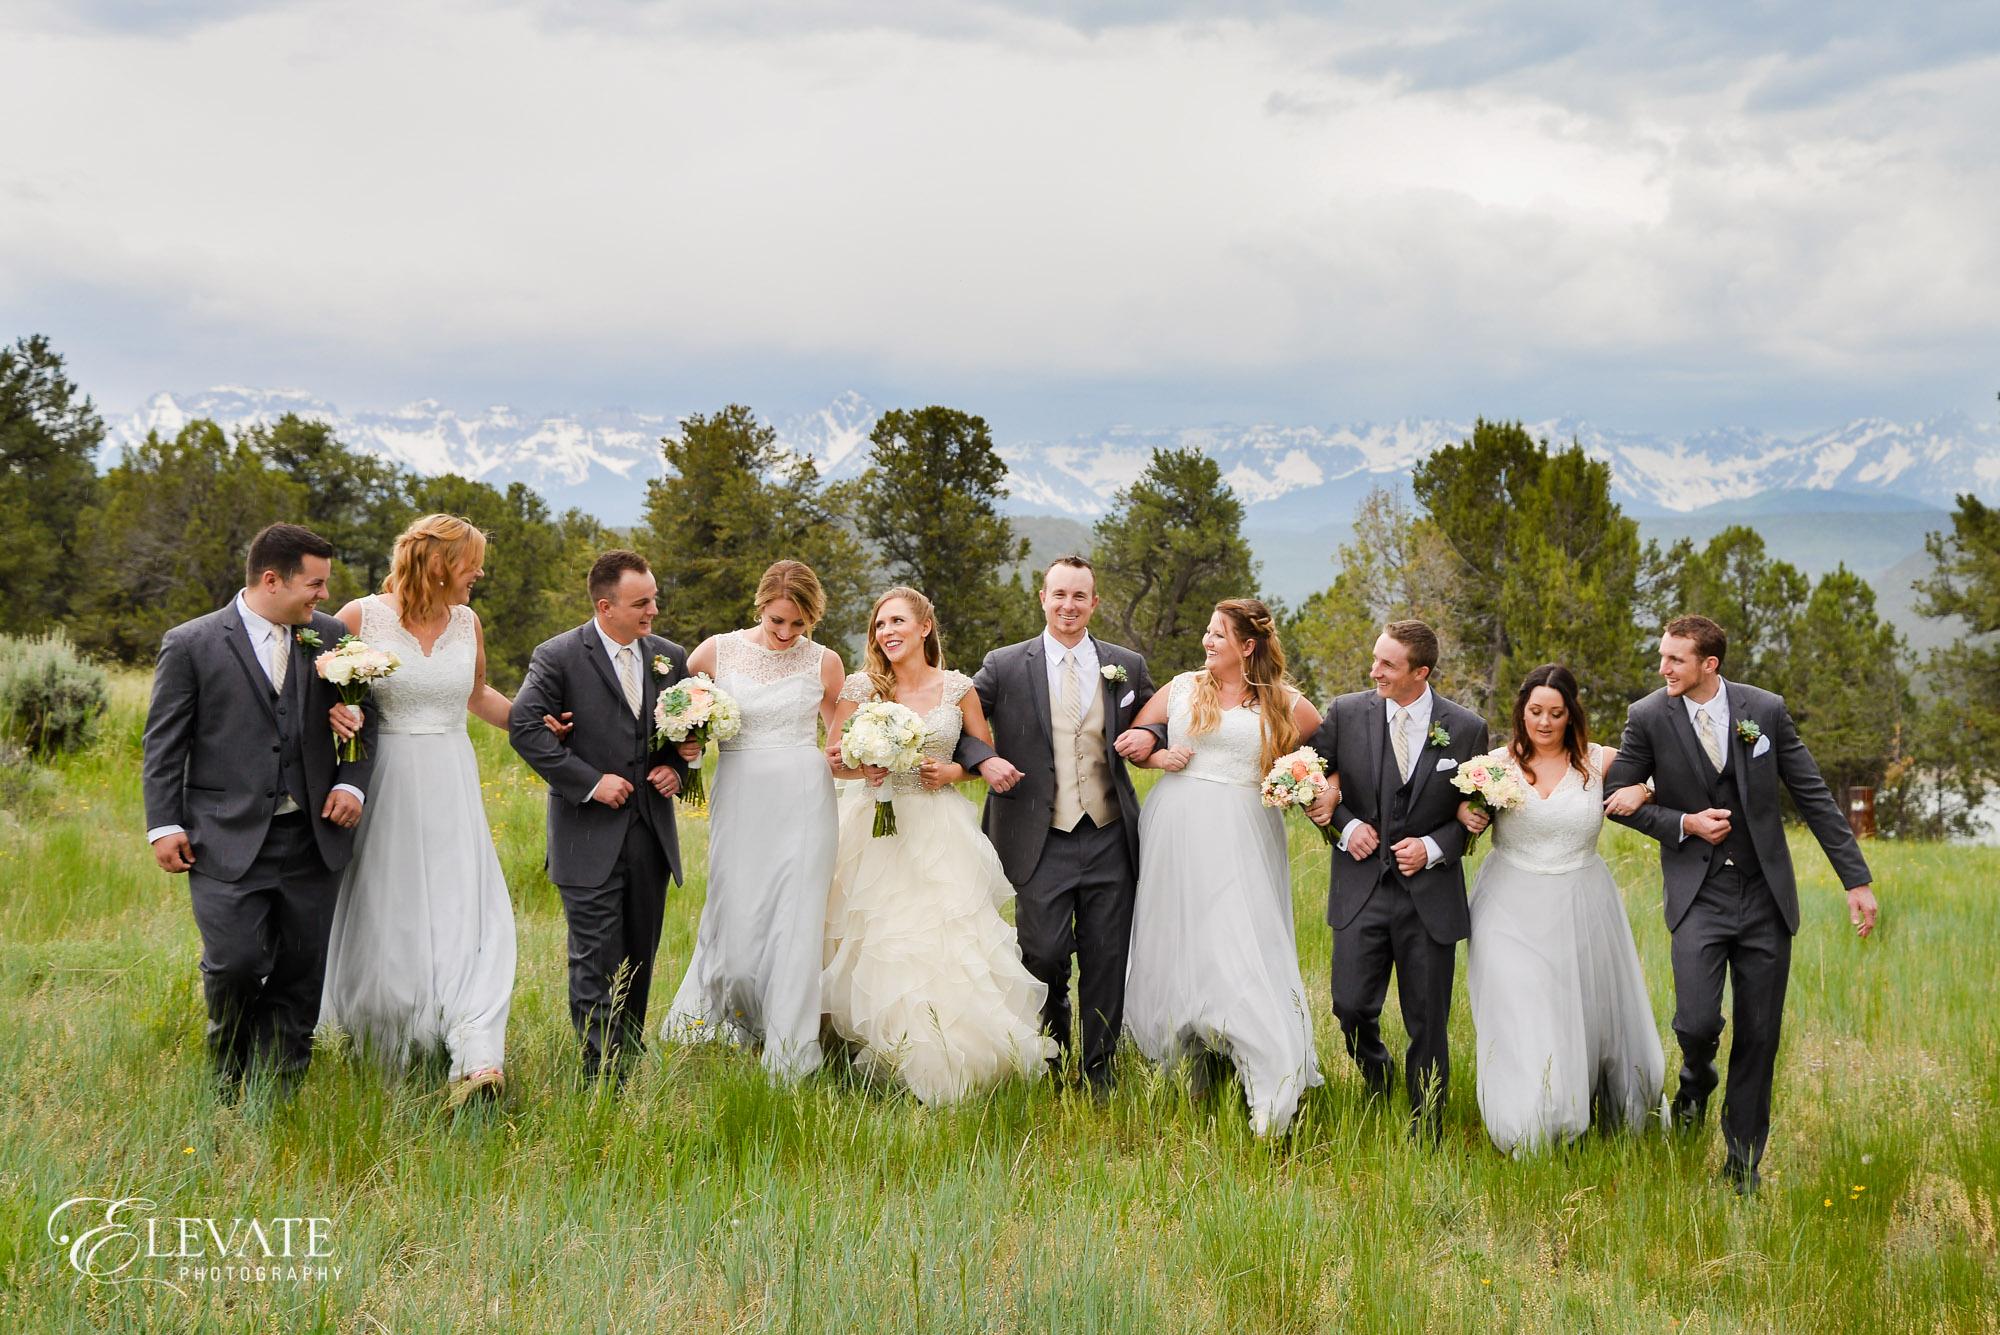 wedding party ridgeway state park